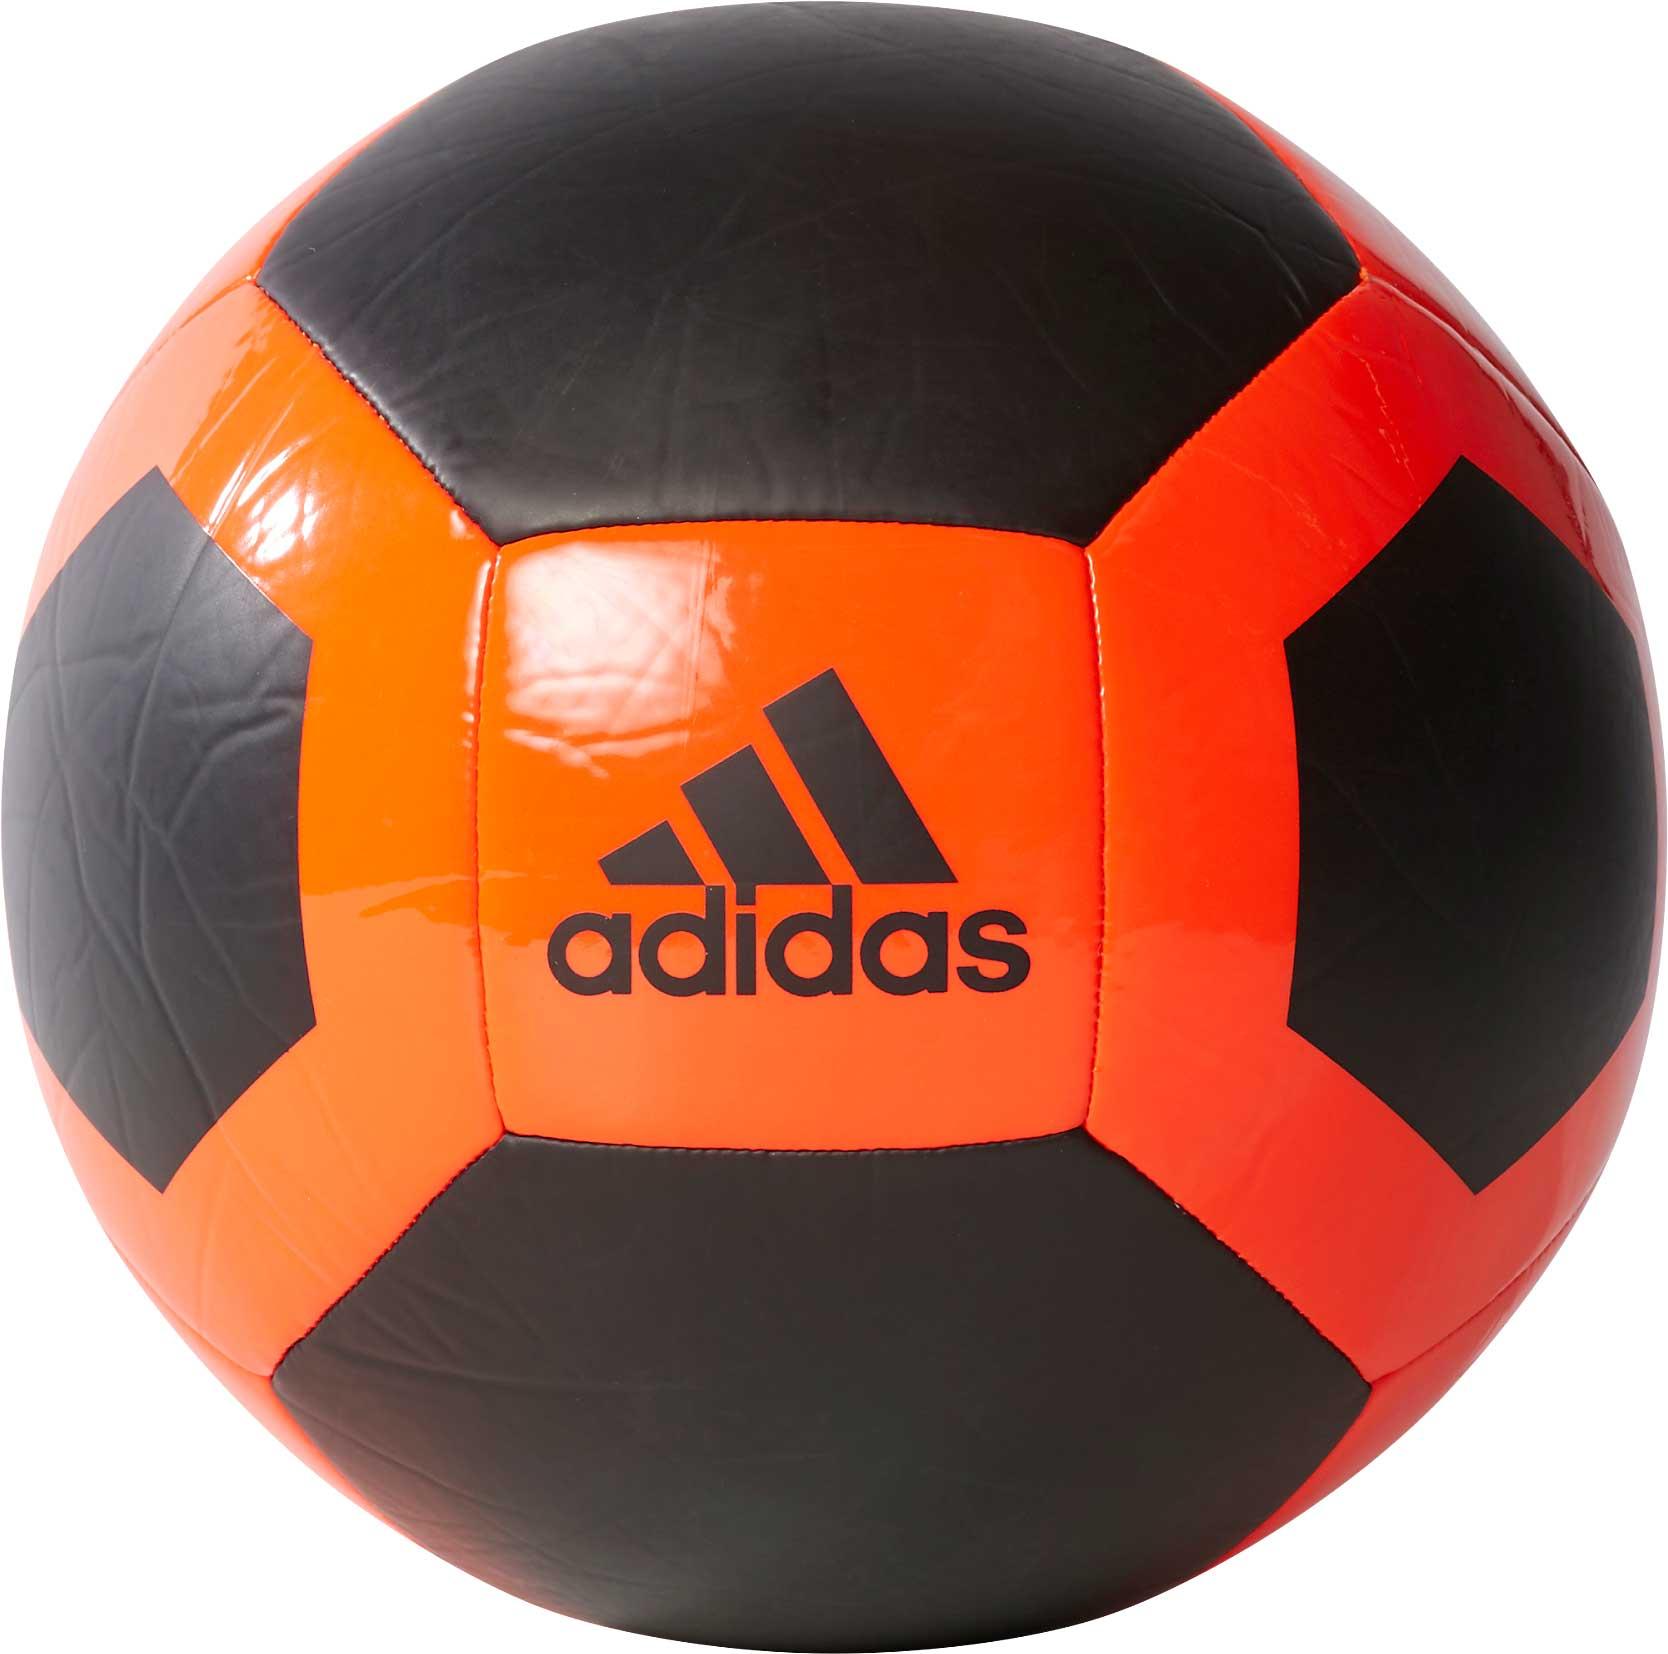 adidas glider ii soccer ball soccerpro com